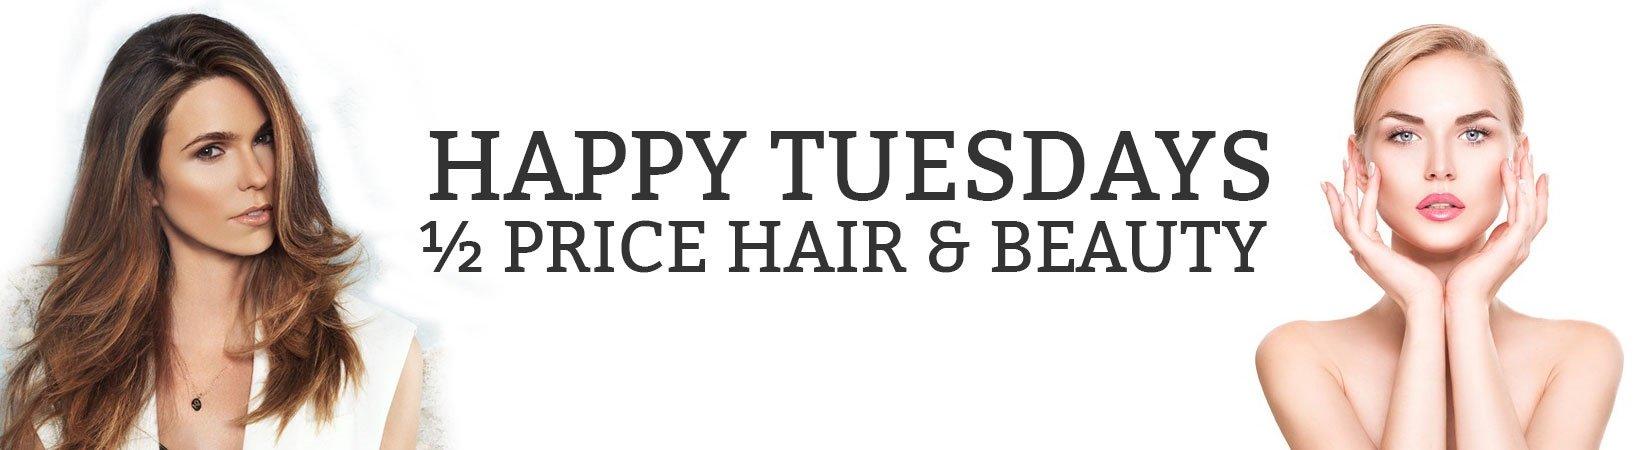 half price hair & beauty offers, birmingham hairdressing salons